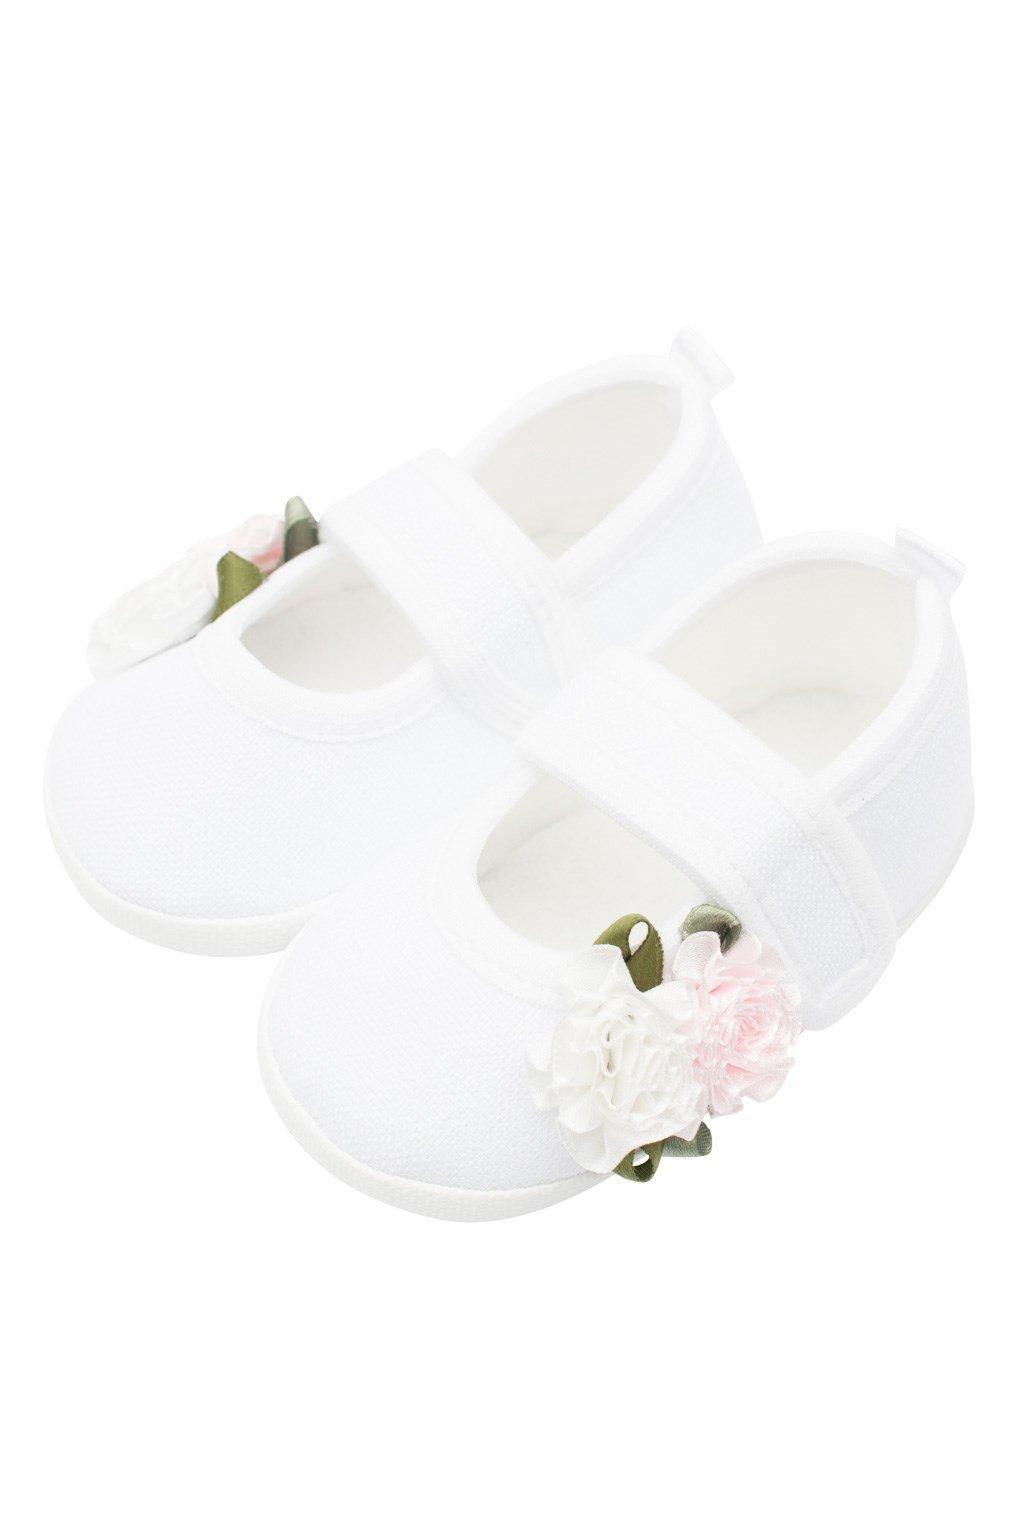 Dojčenské capačky New Baby Linen biele 6-12 m roses